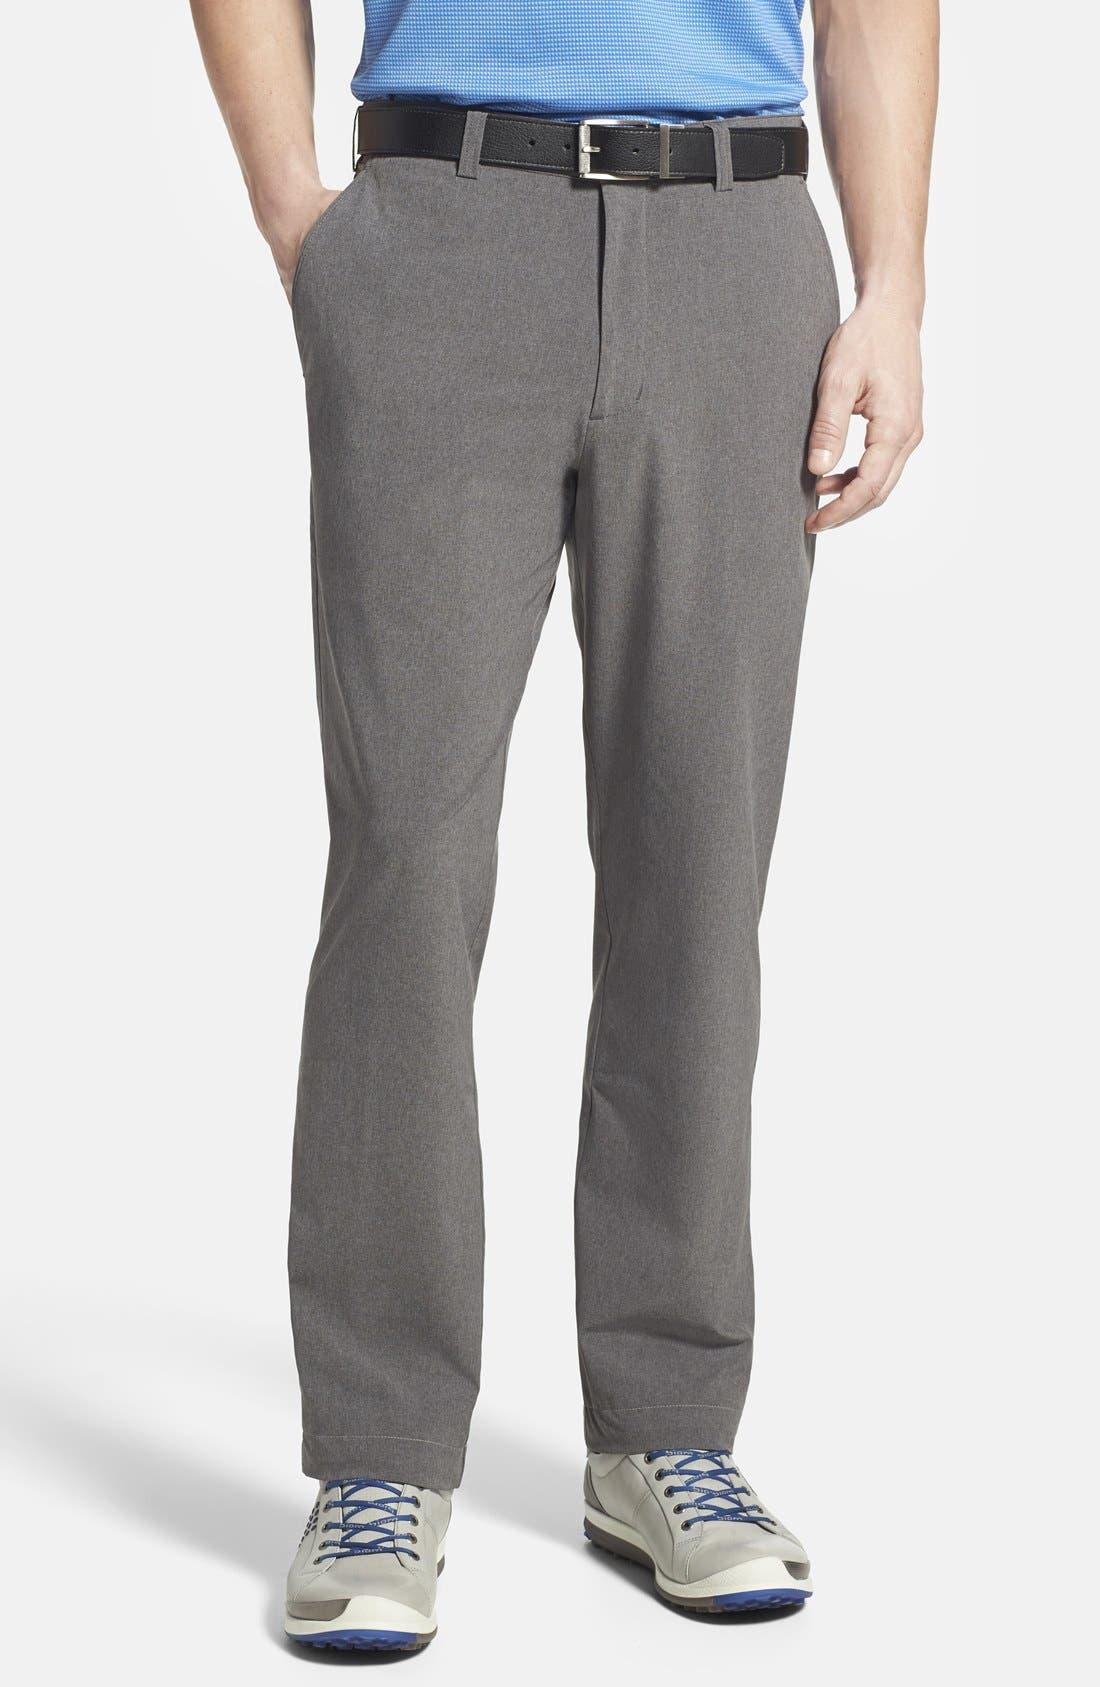 Bainbridge DryTec Moisture Wicking Flat Front Pants,                             Main thumbnail 1, color,                             IRON GREY